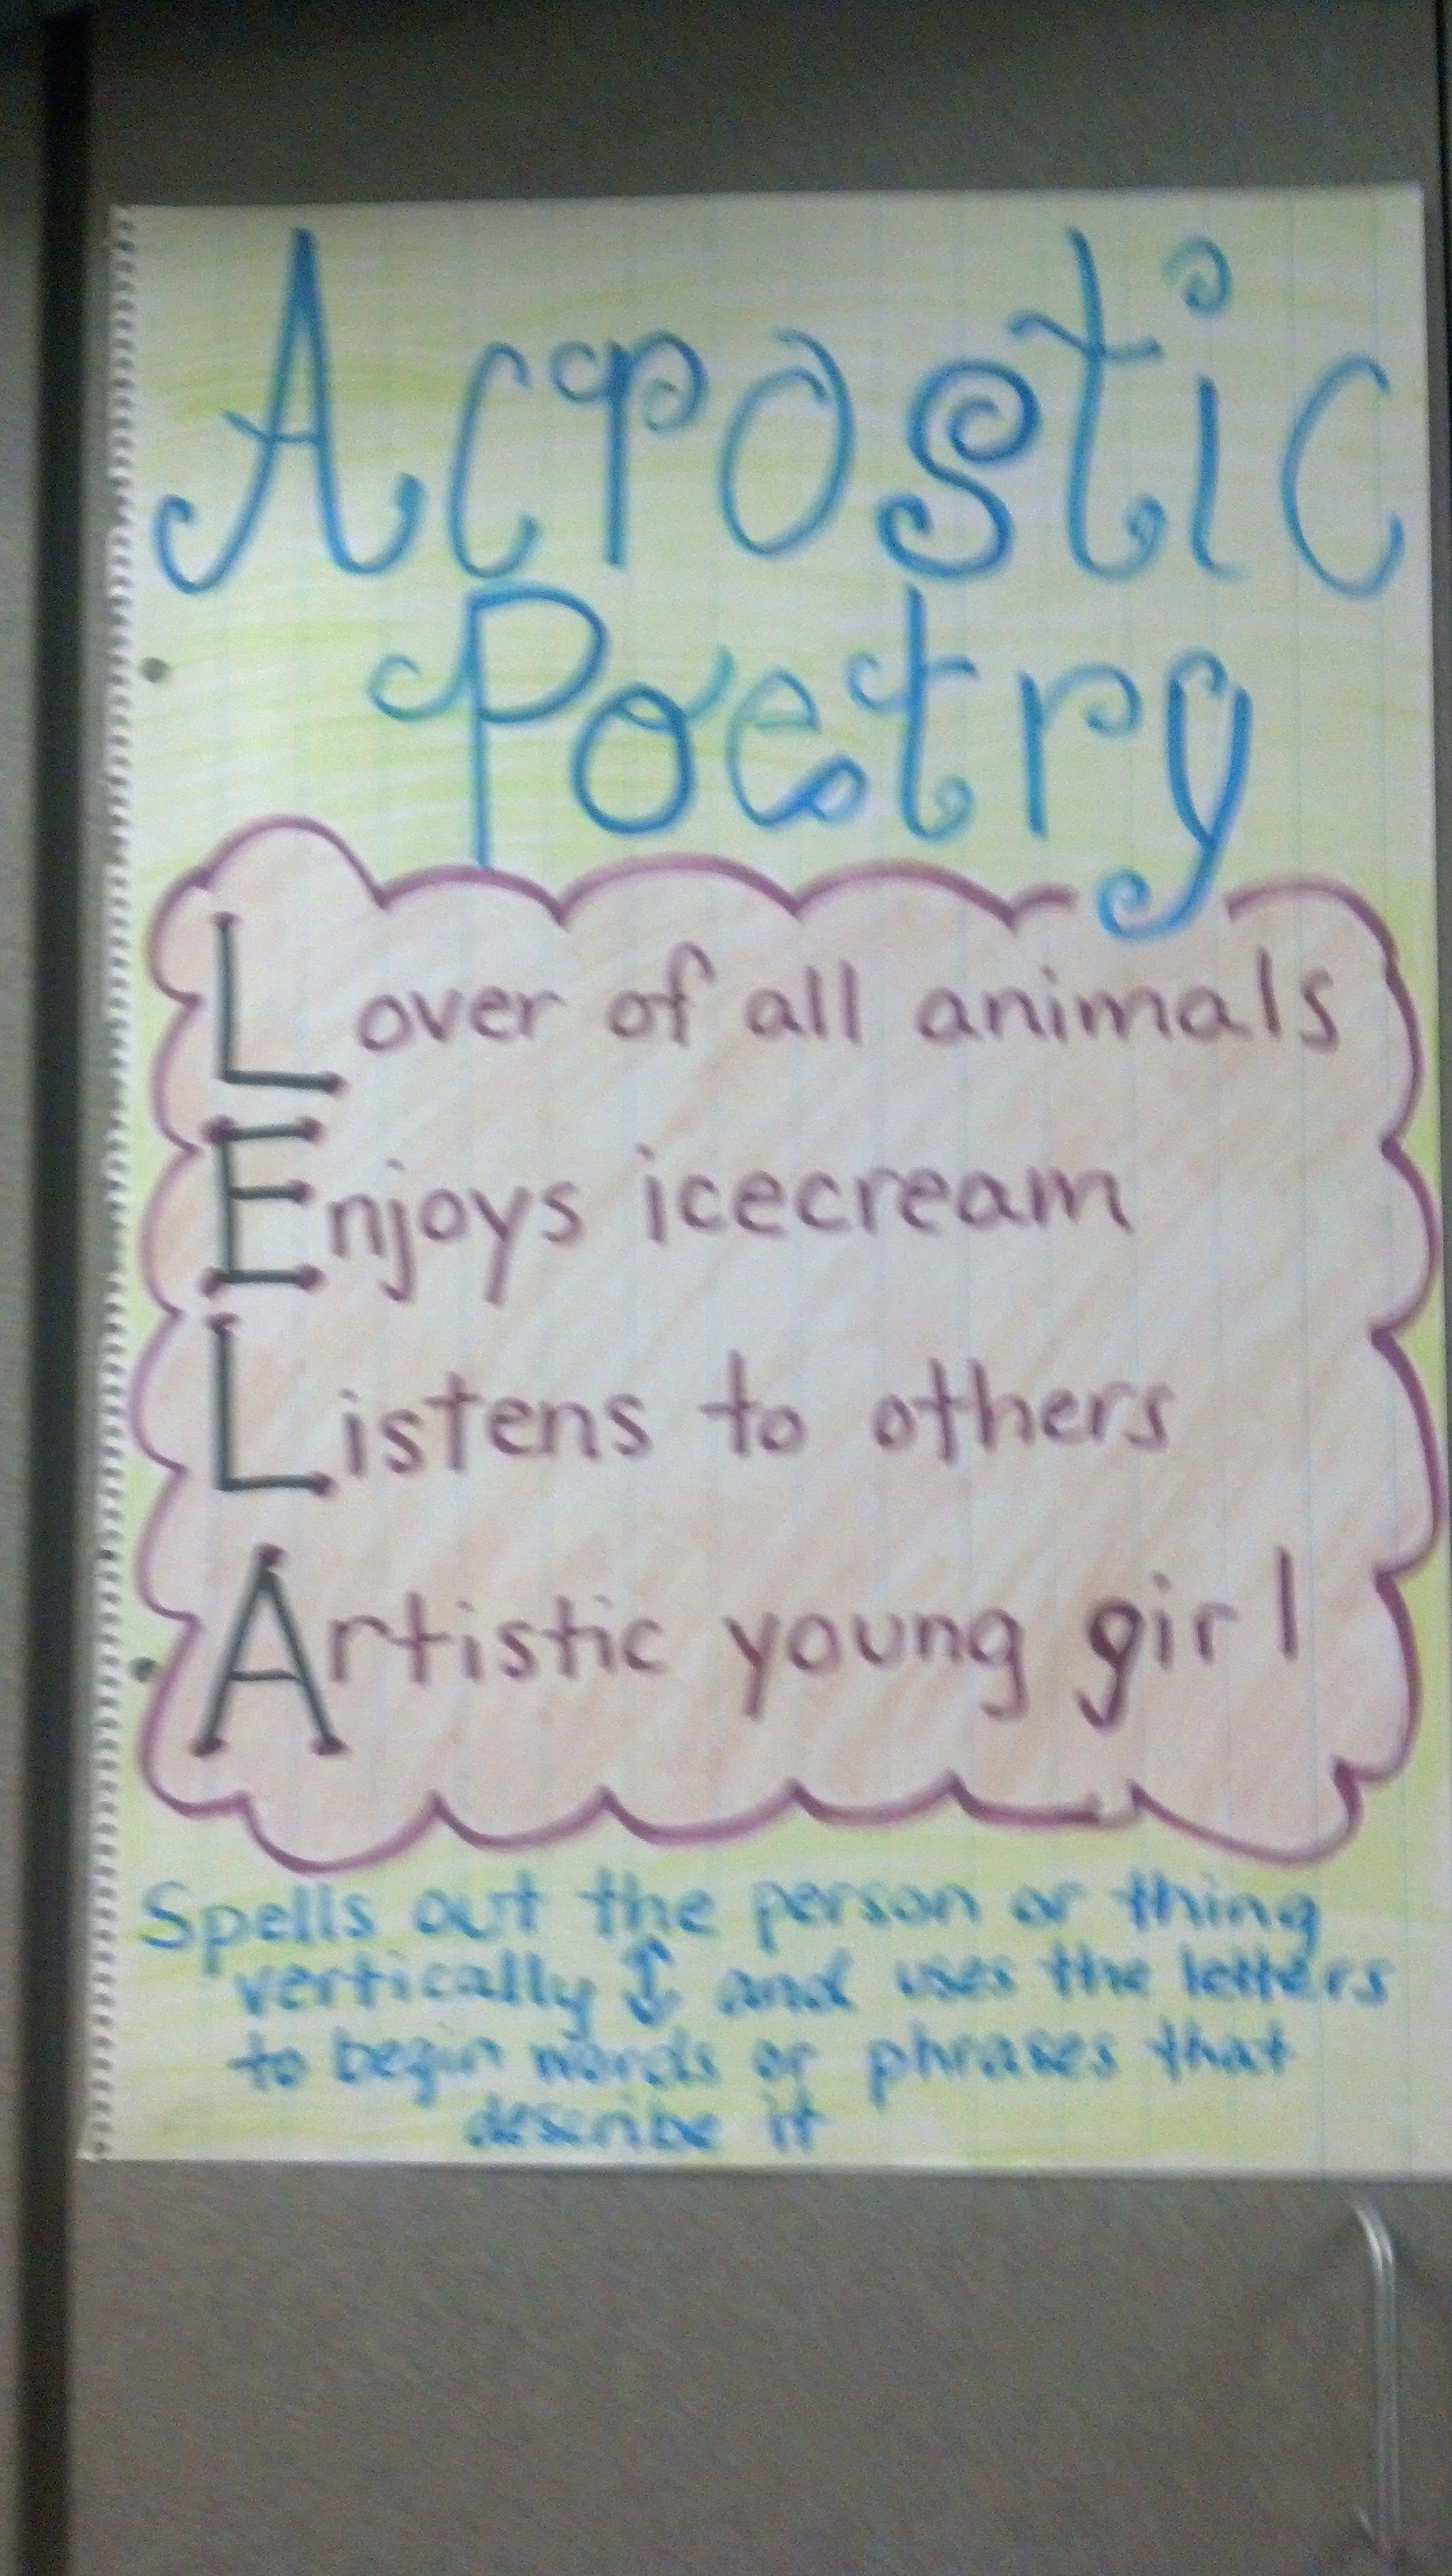 Holiday Poem Generator K-5 Computer Lab Acrostic name poem maker with photo